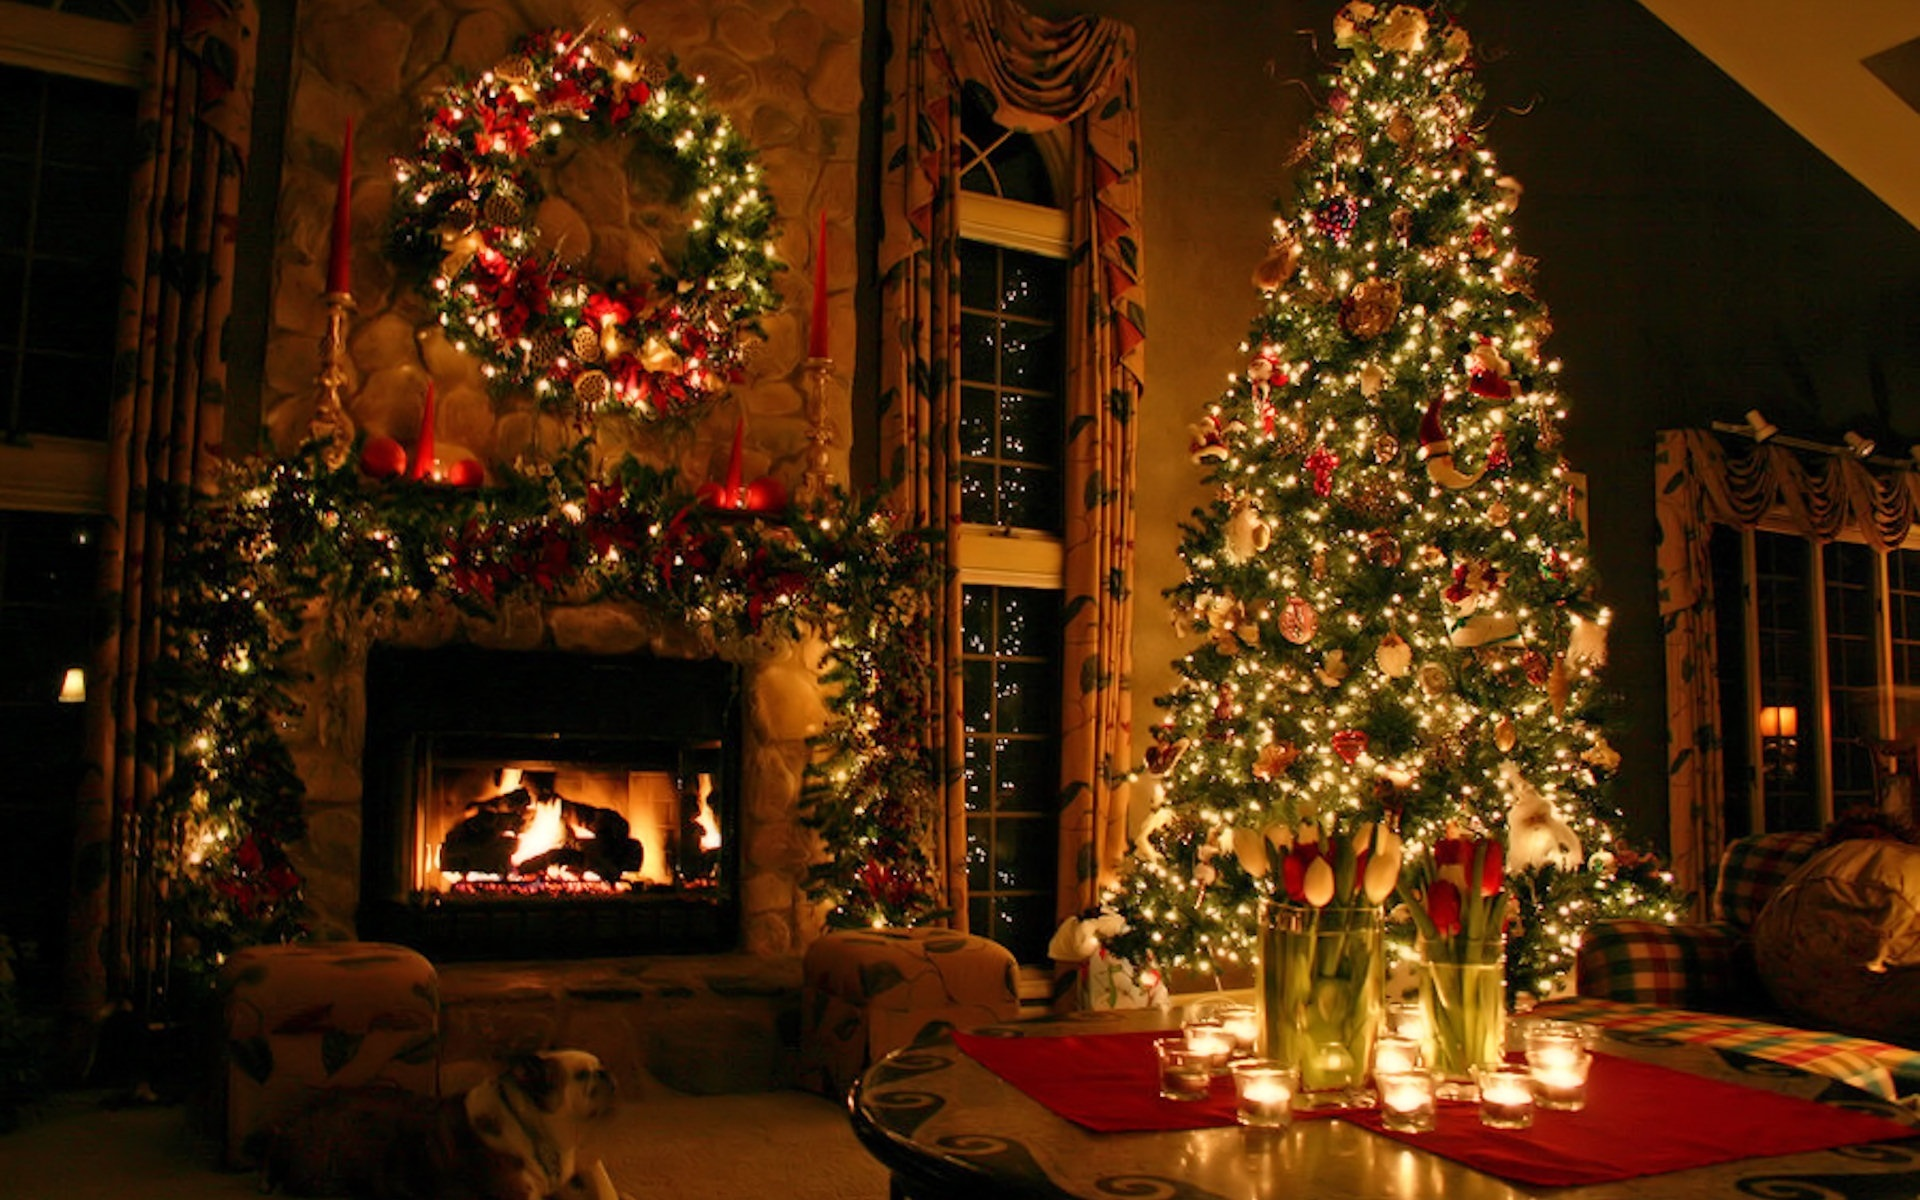 Christmas Tree Room christmas trees - pre-tend be curious.